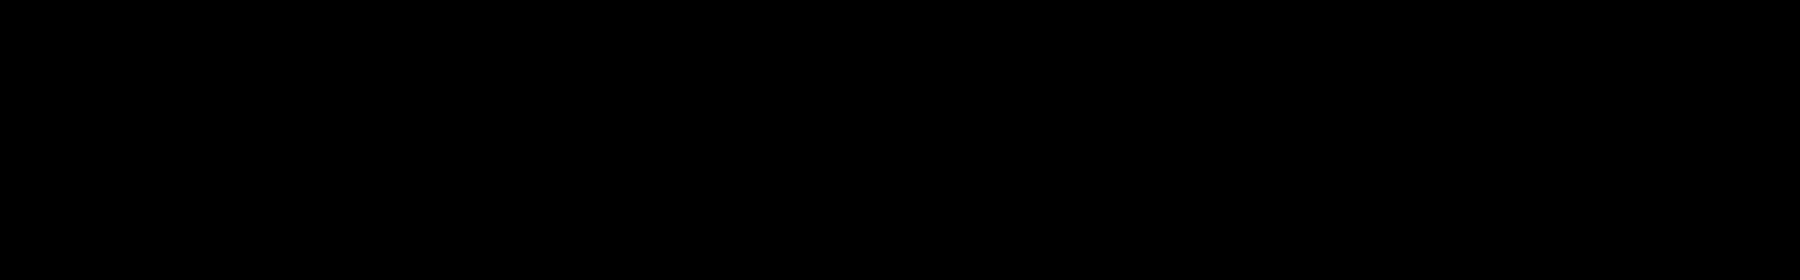 Maj Lazer audio waveform